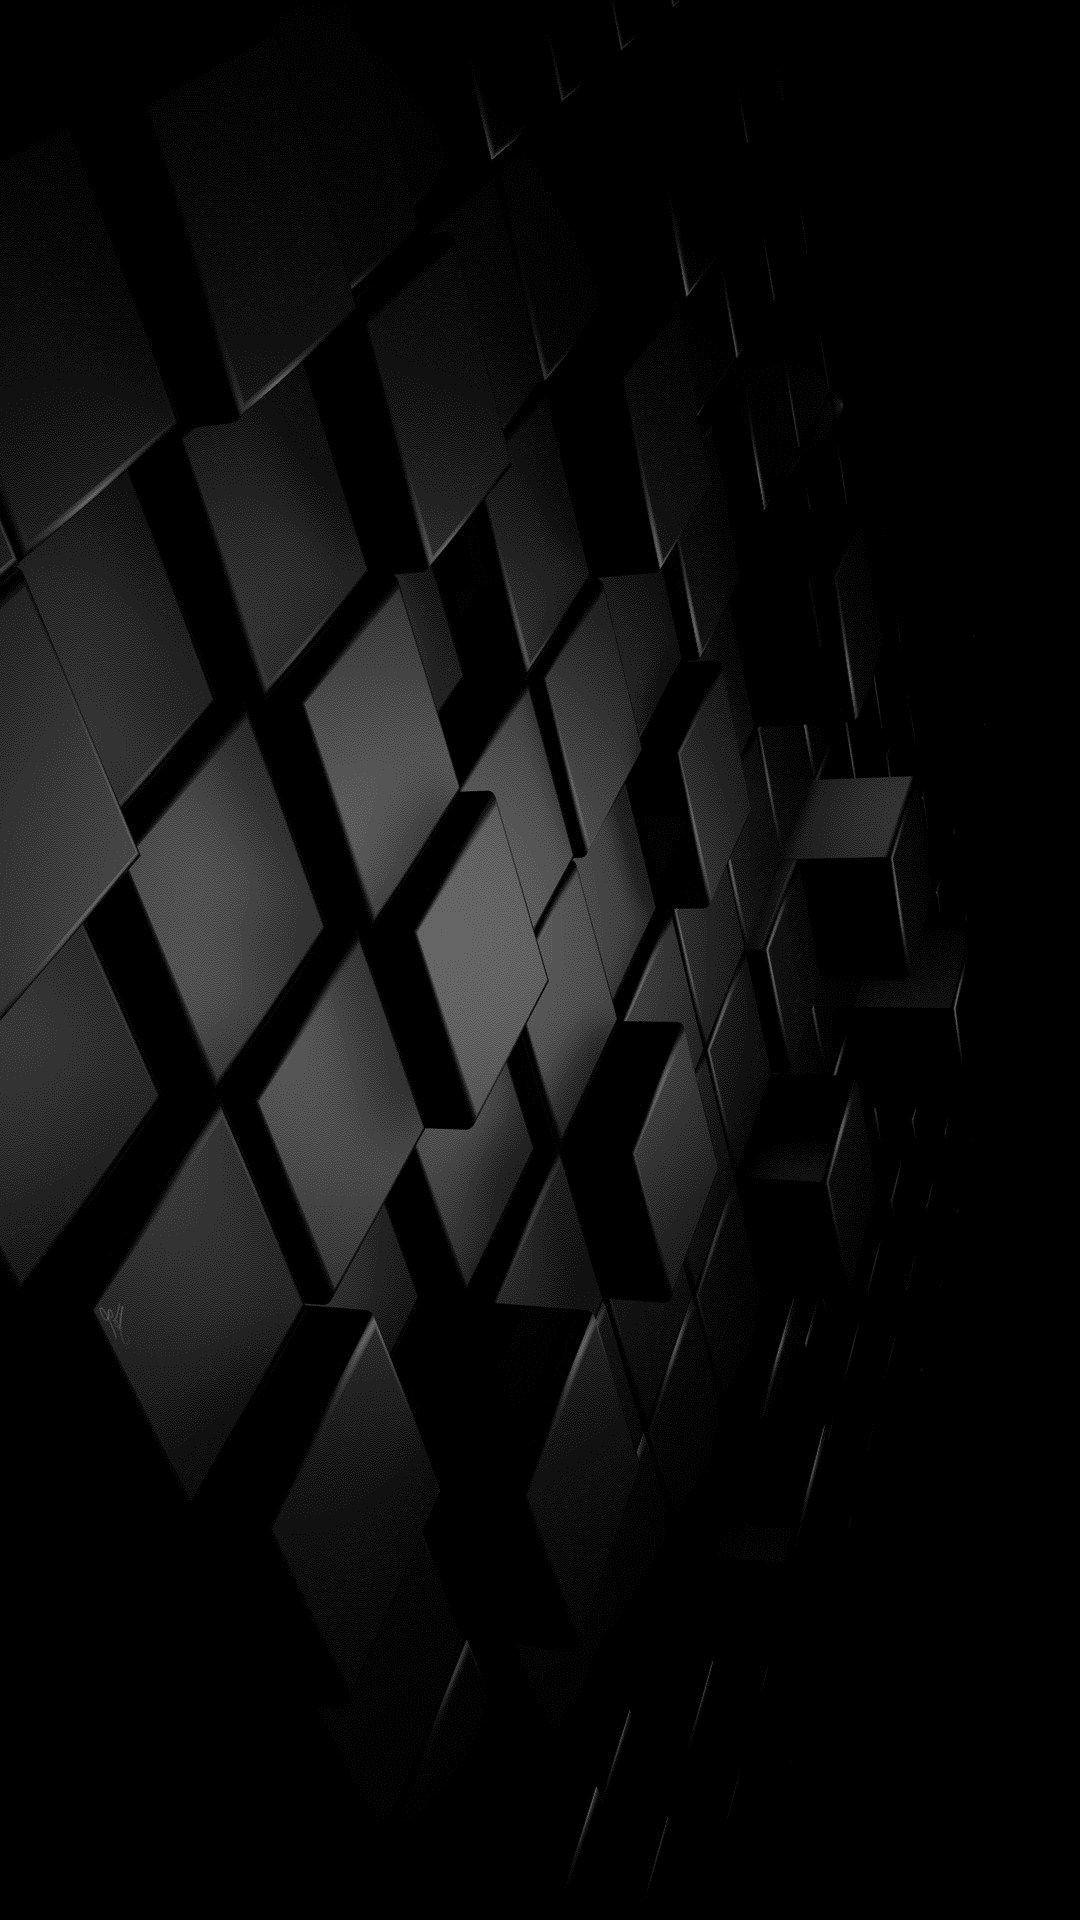 Dark wallpaper iphone